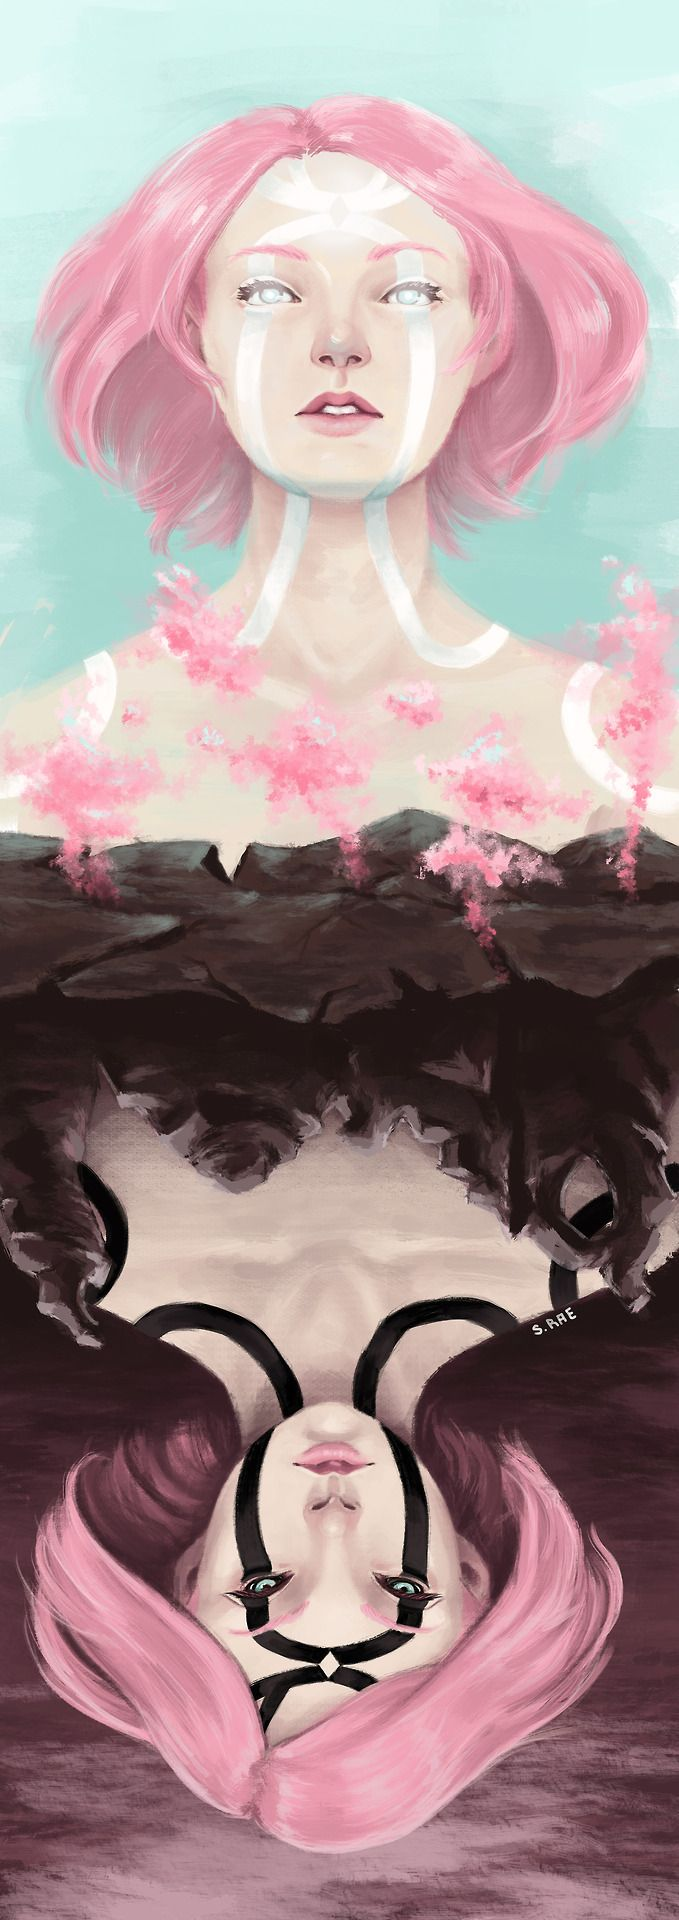 Sakura's byakugou by yourturntowatchmyback on tumblr